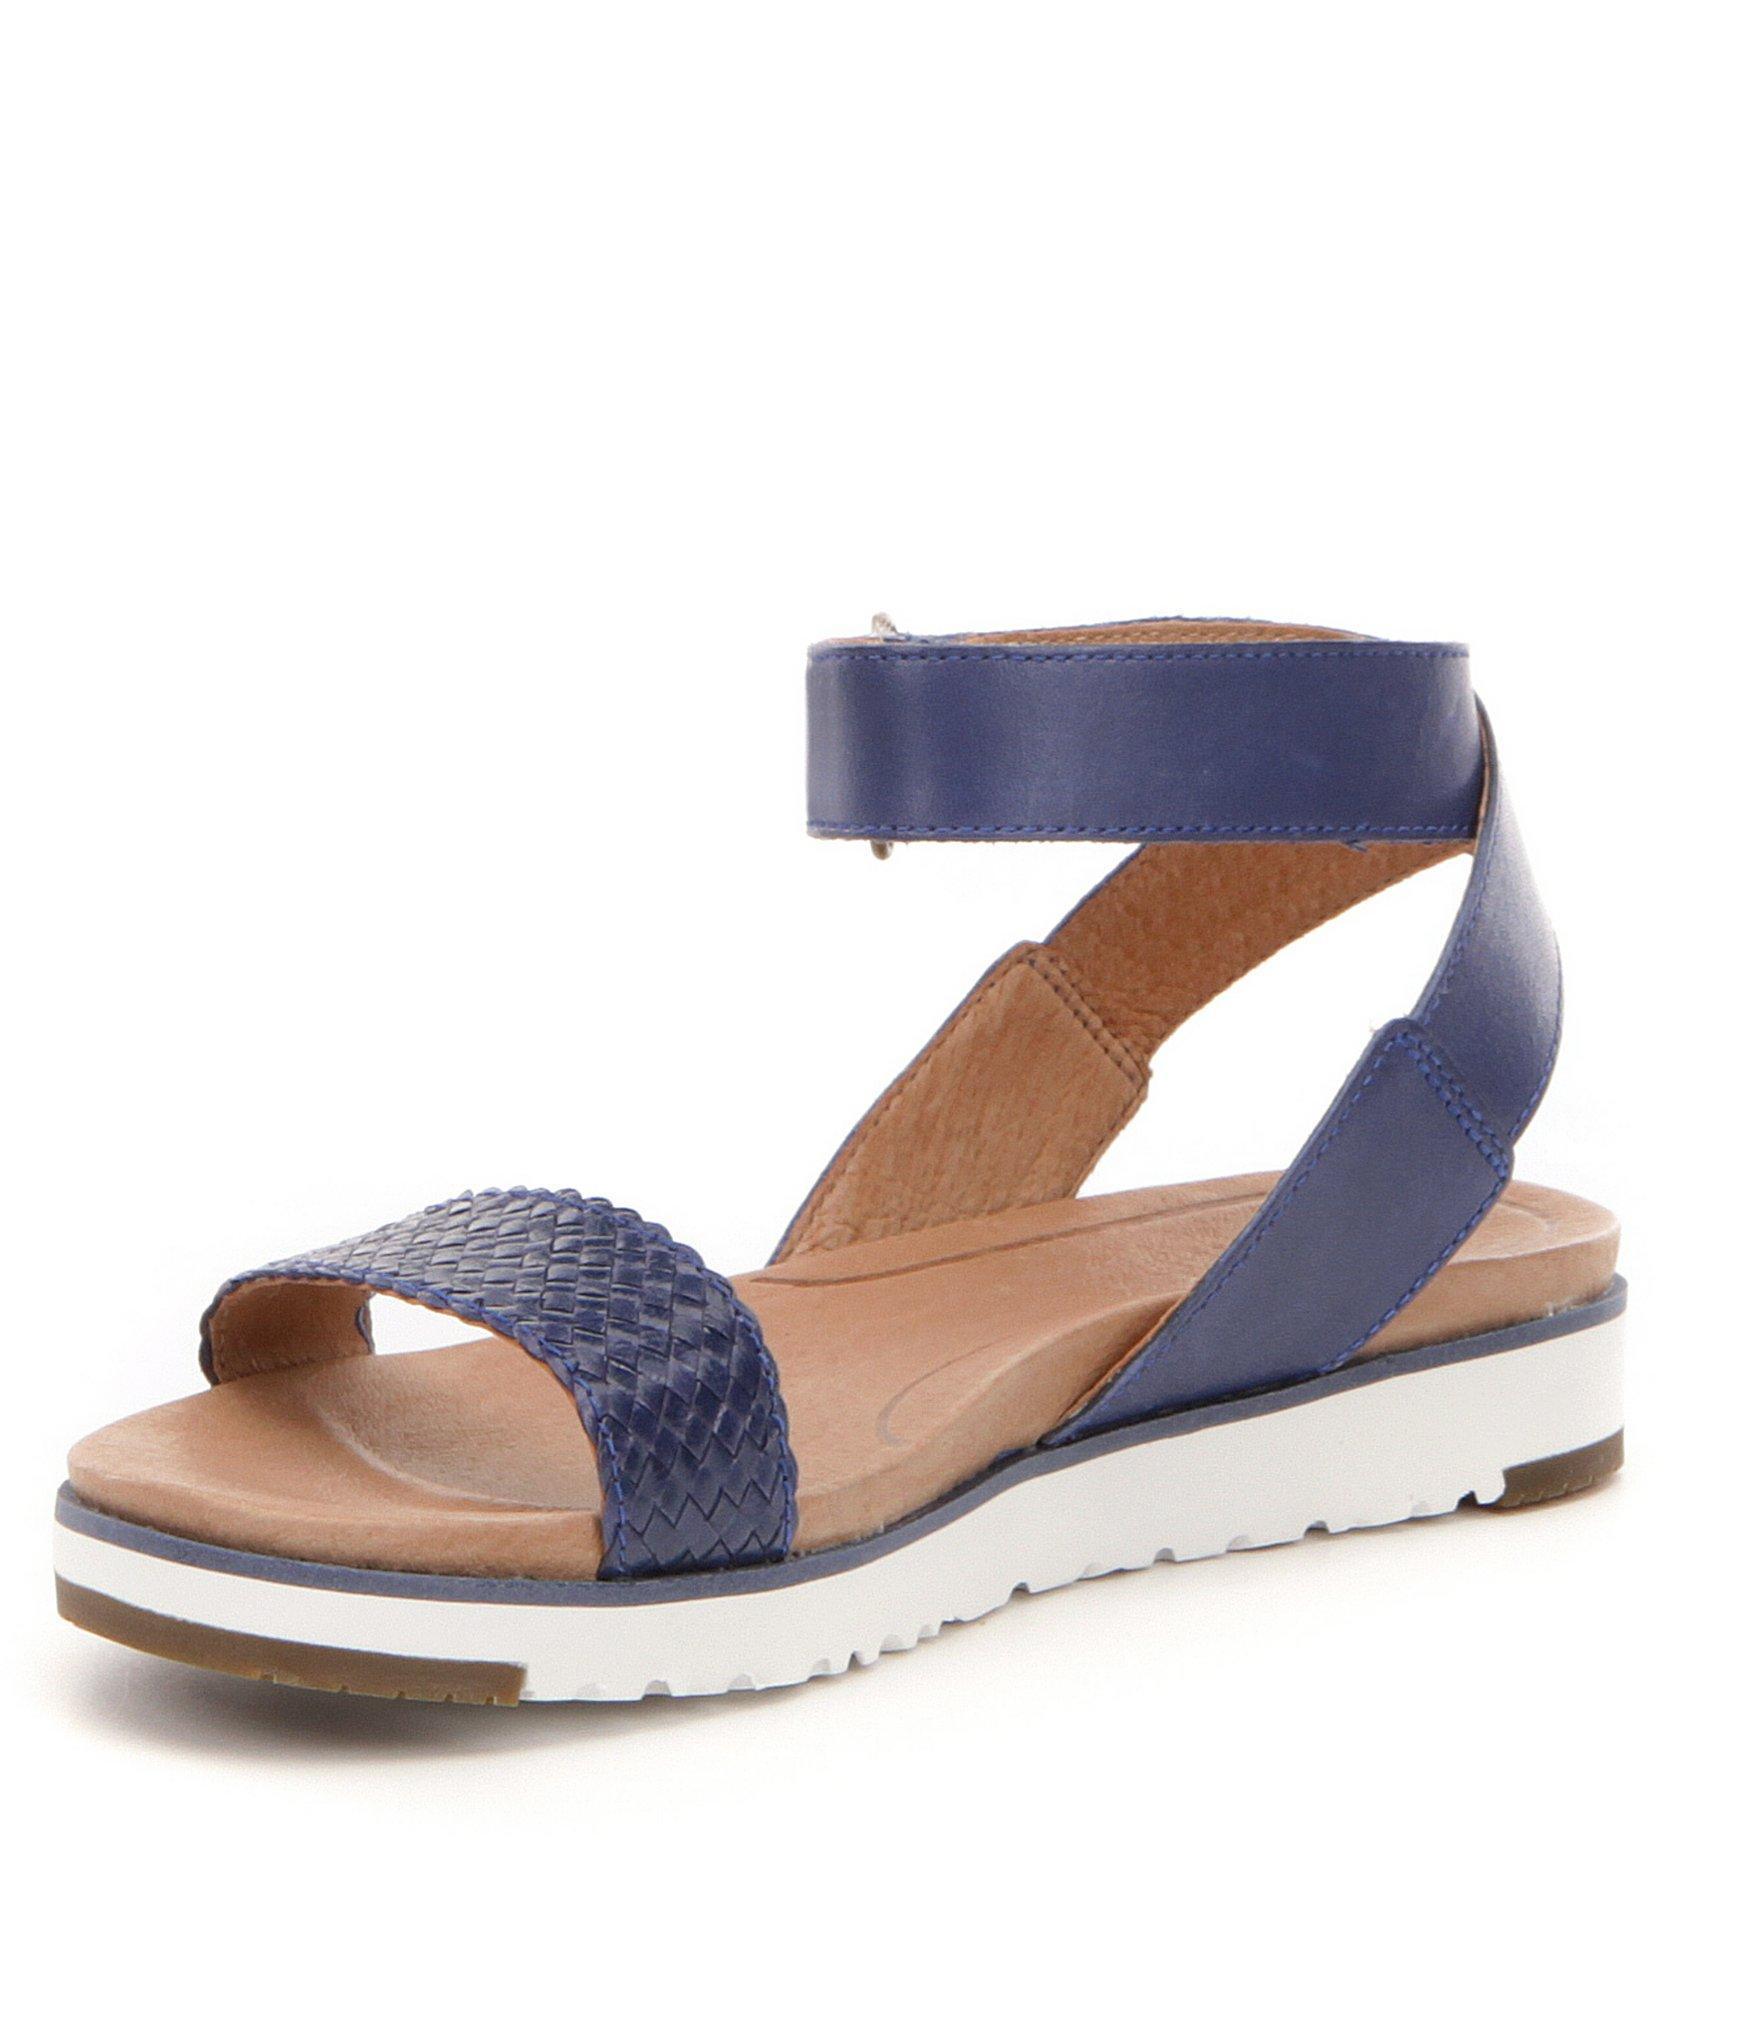 e19a108e454 Ugg Blue ® Laddie Leather Sandals